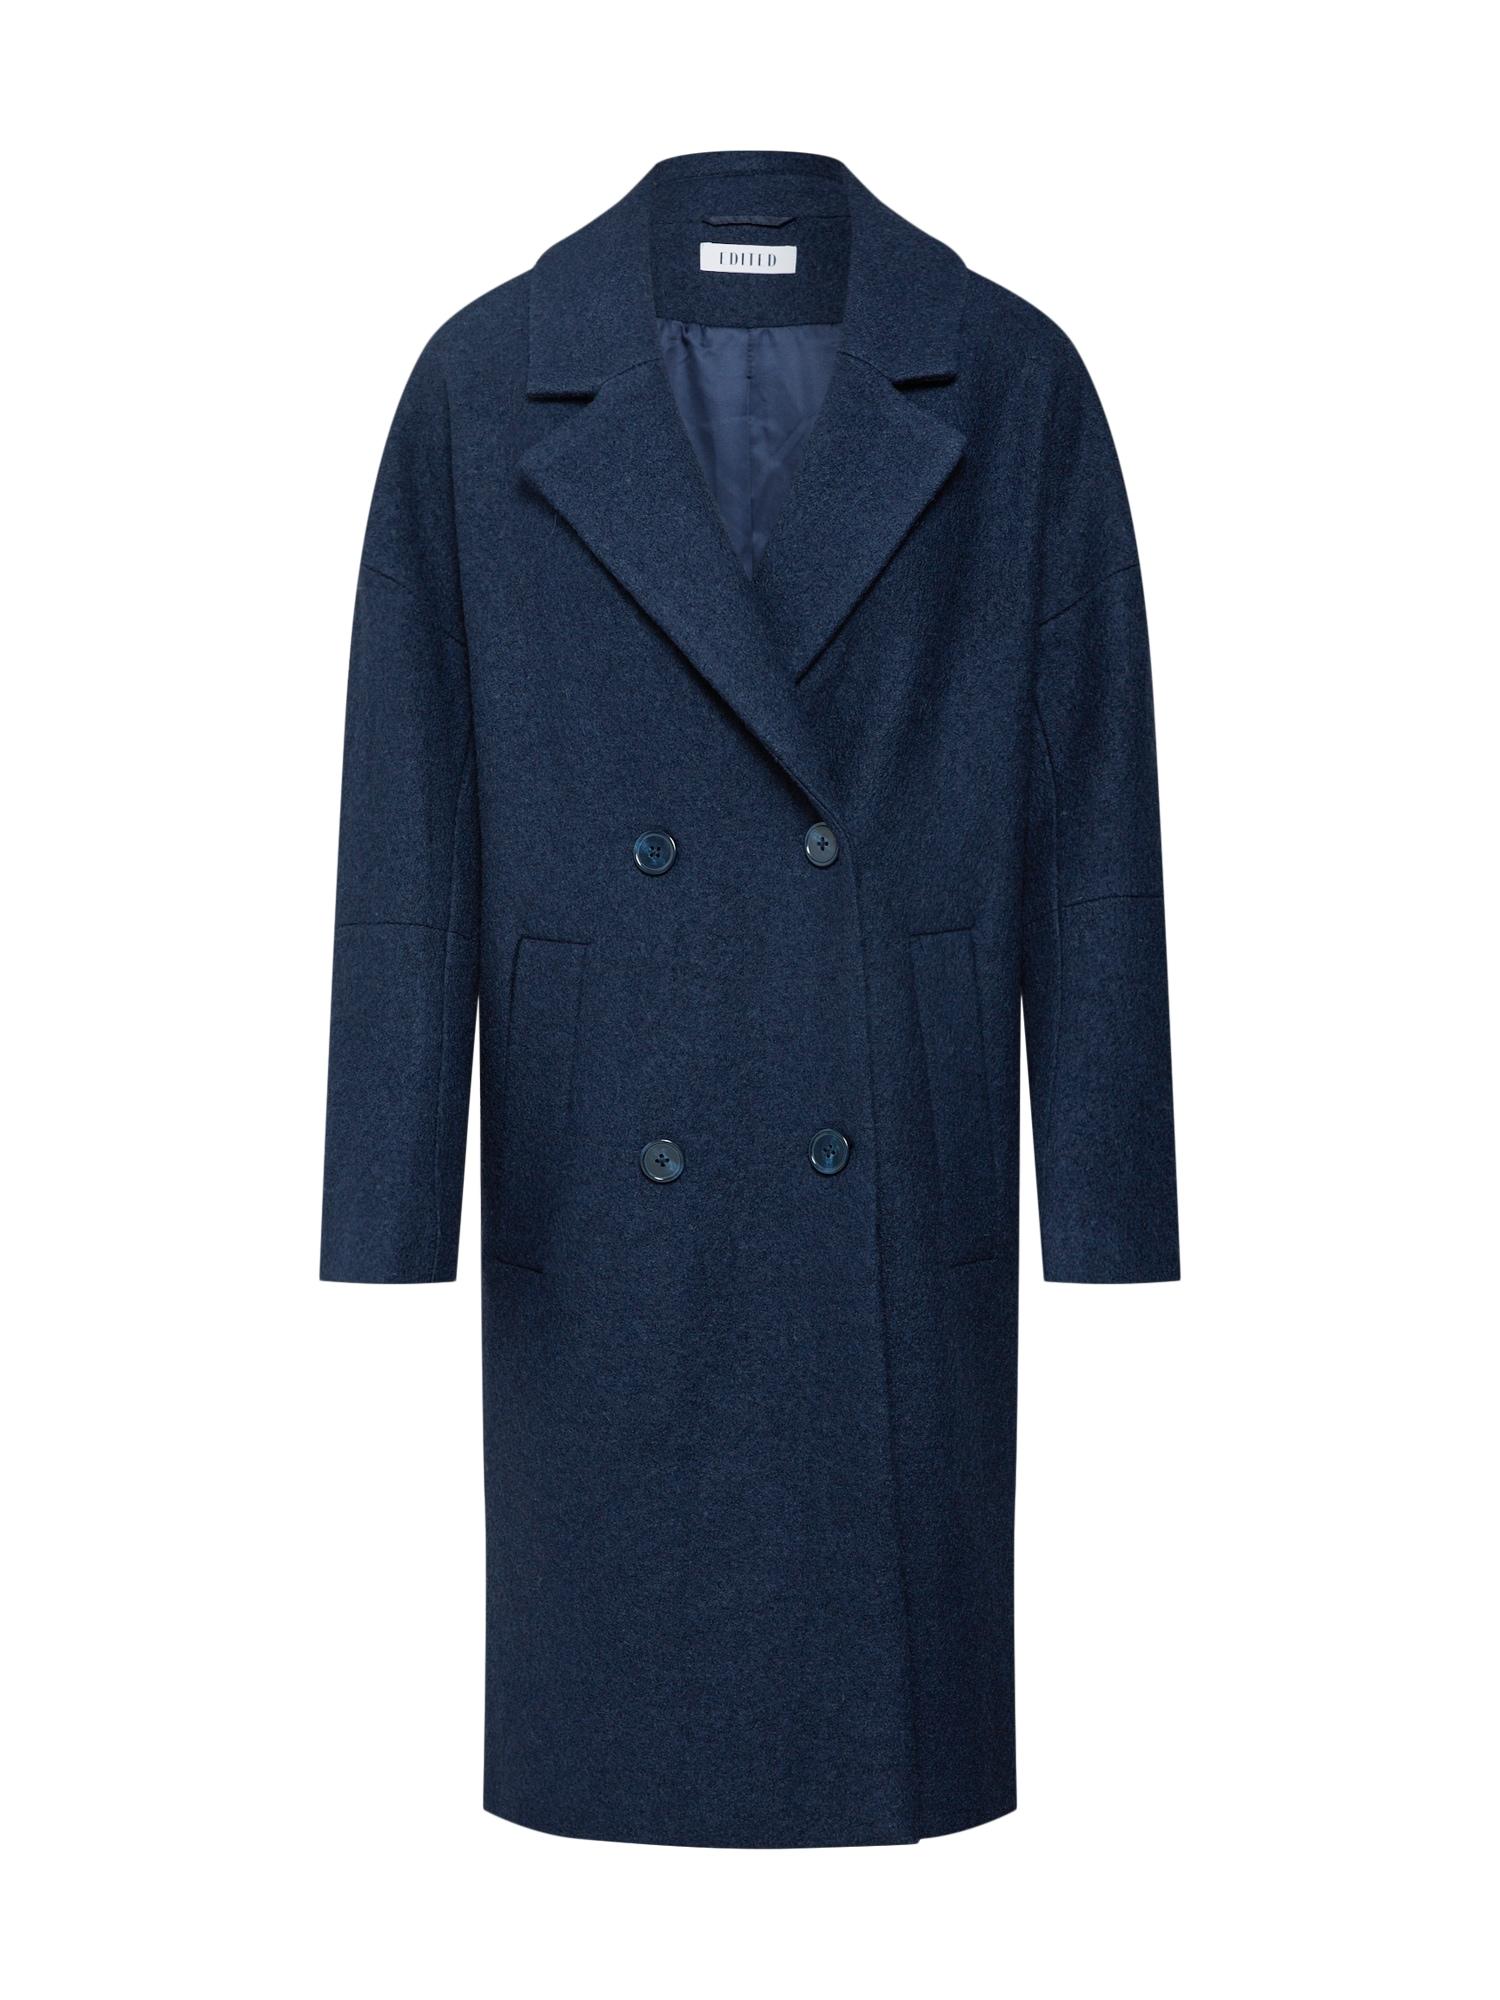 EDITED Žieminis paltas 'Hanne' tamsiai mėlyna